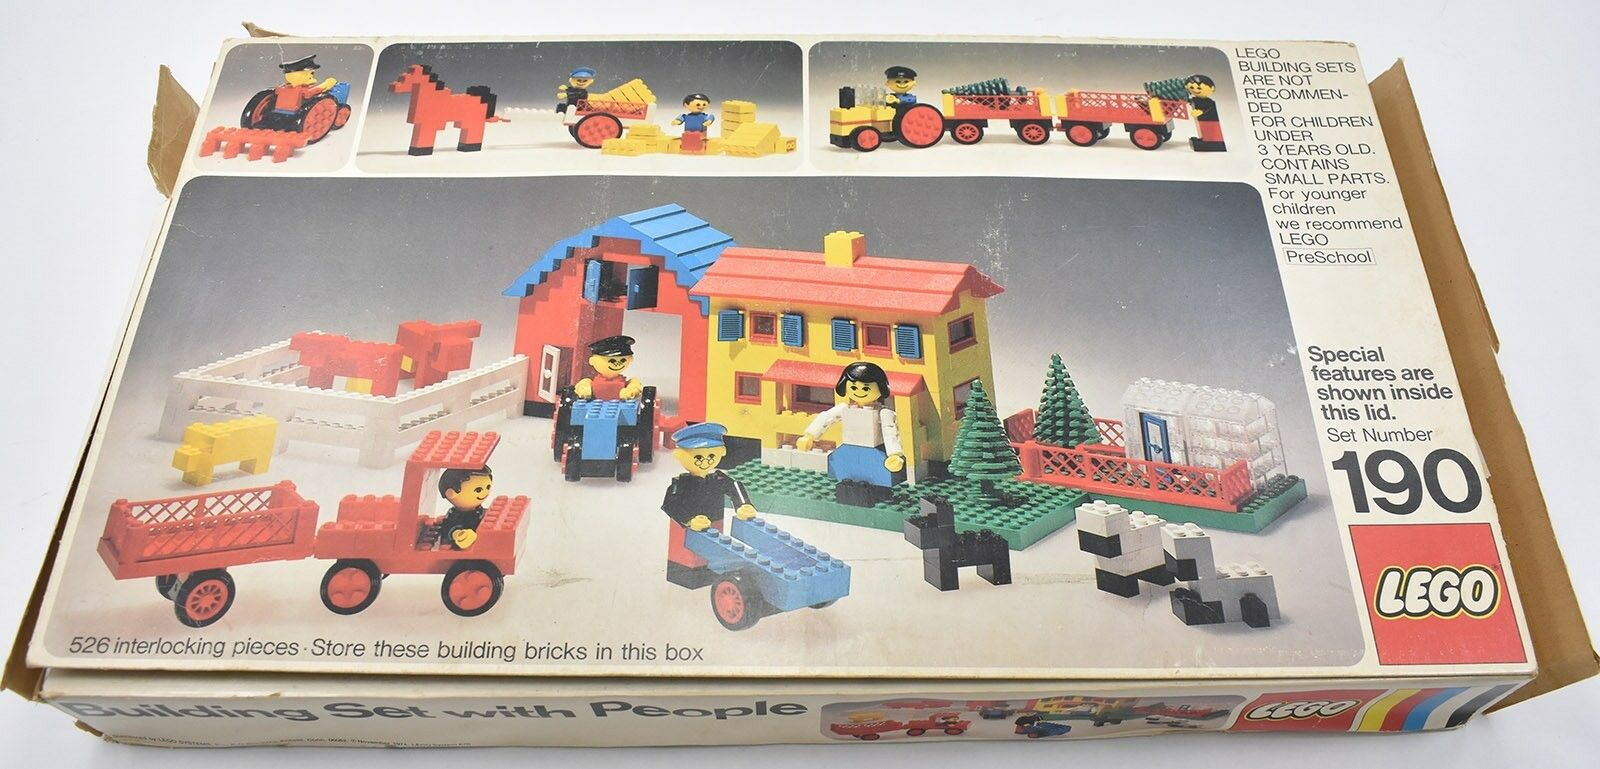 Lego Vintage Farm Building Set With People % Complete Complete Complete Set 1975 With Box ae4f07